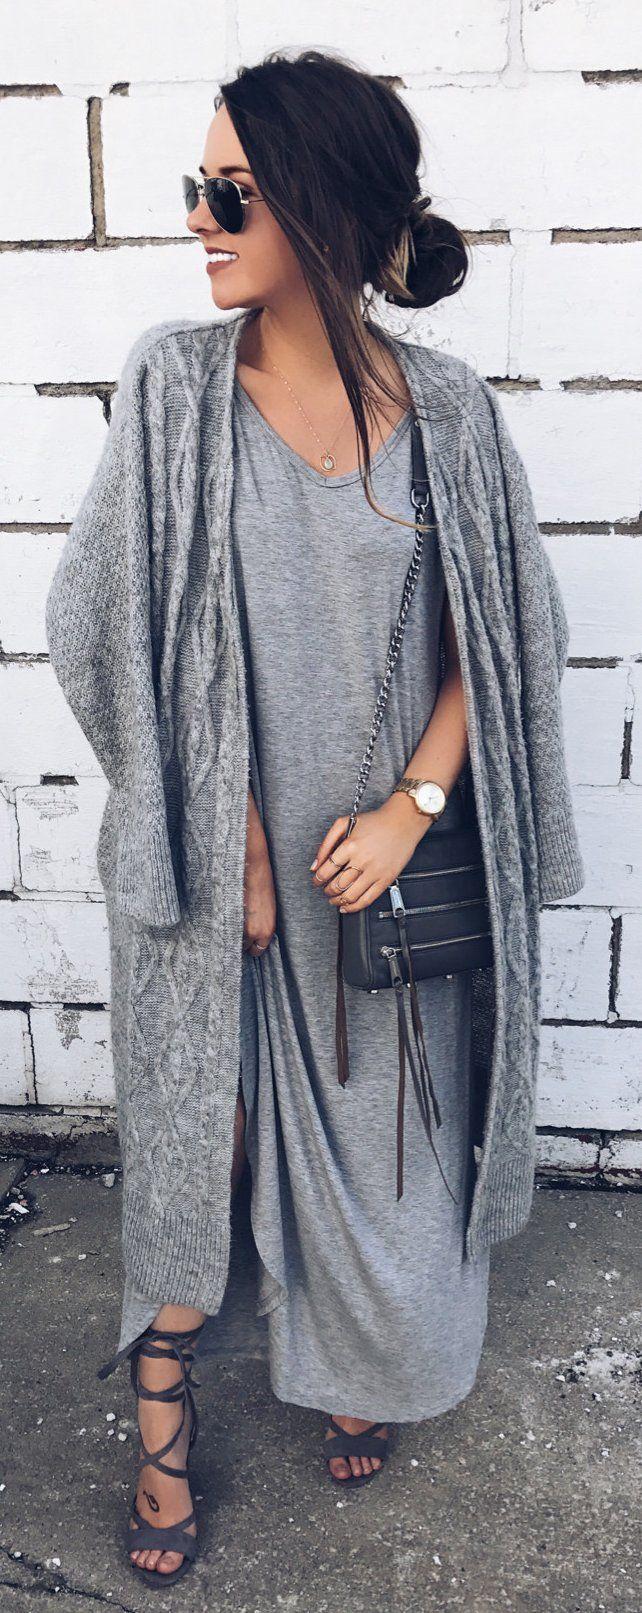 Grey Maxi Dress & Grey Maxi Cardigan & Dark Sandals